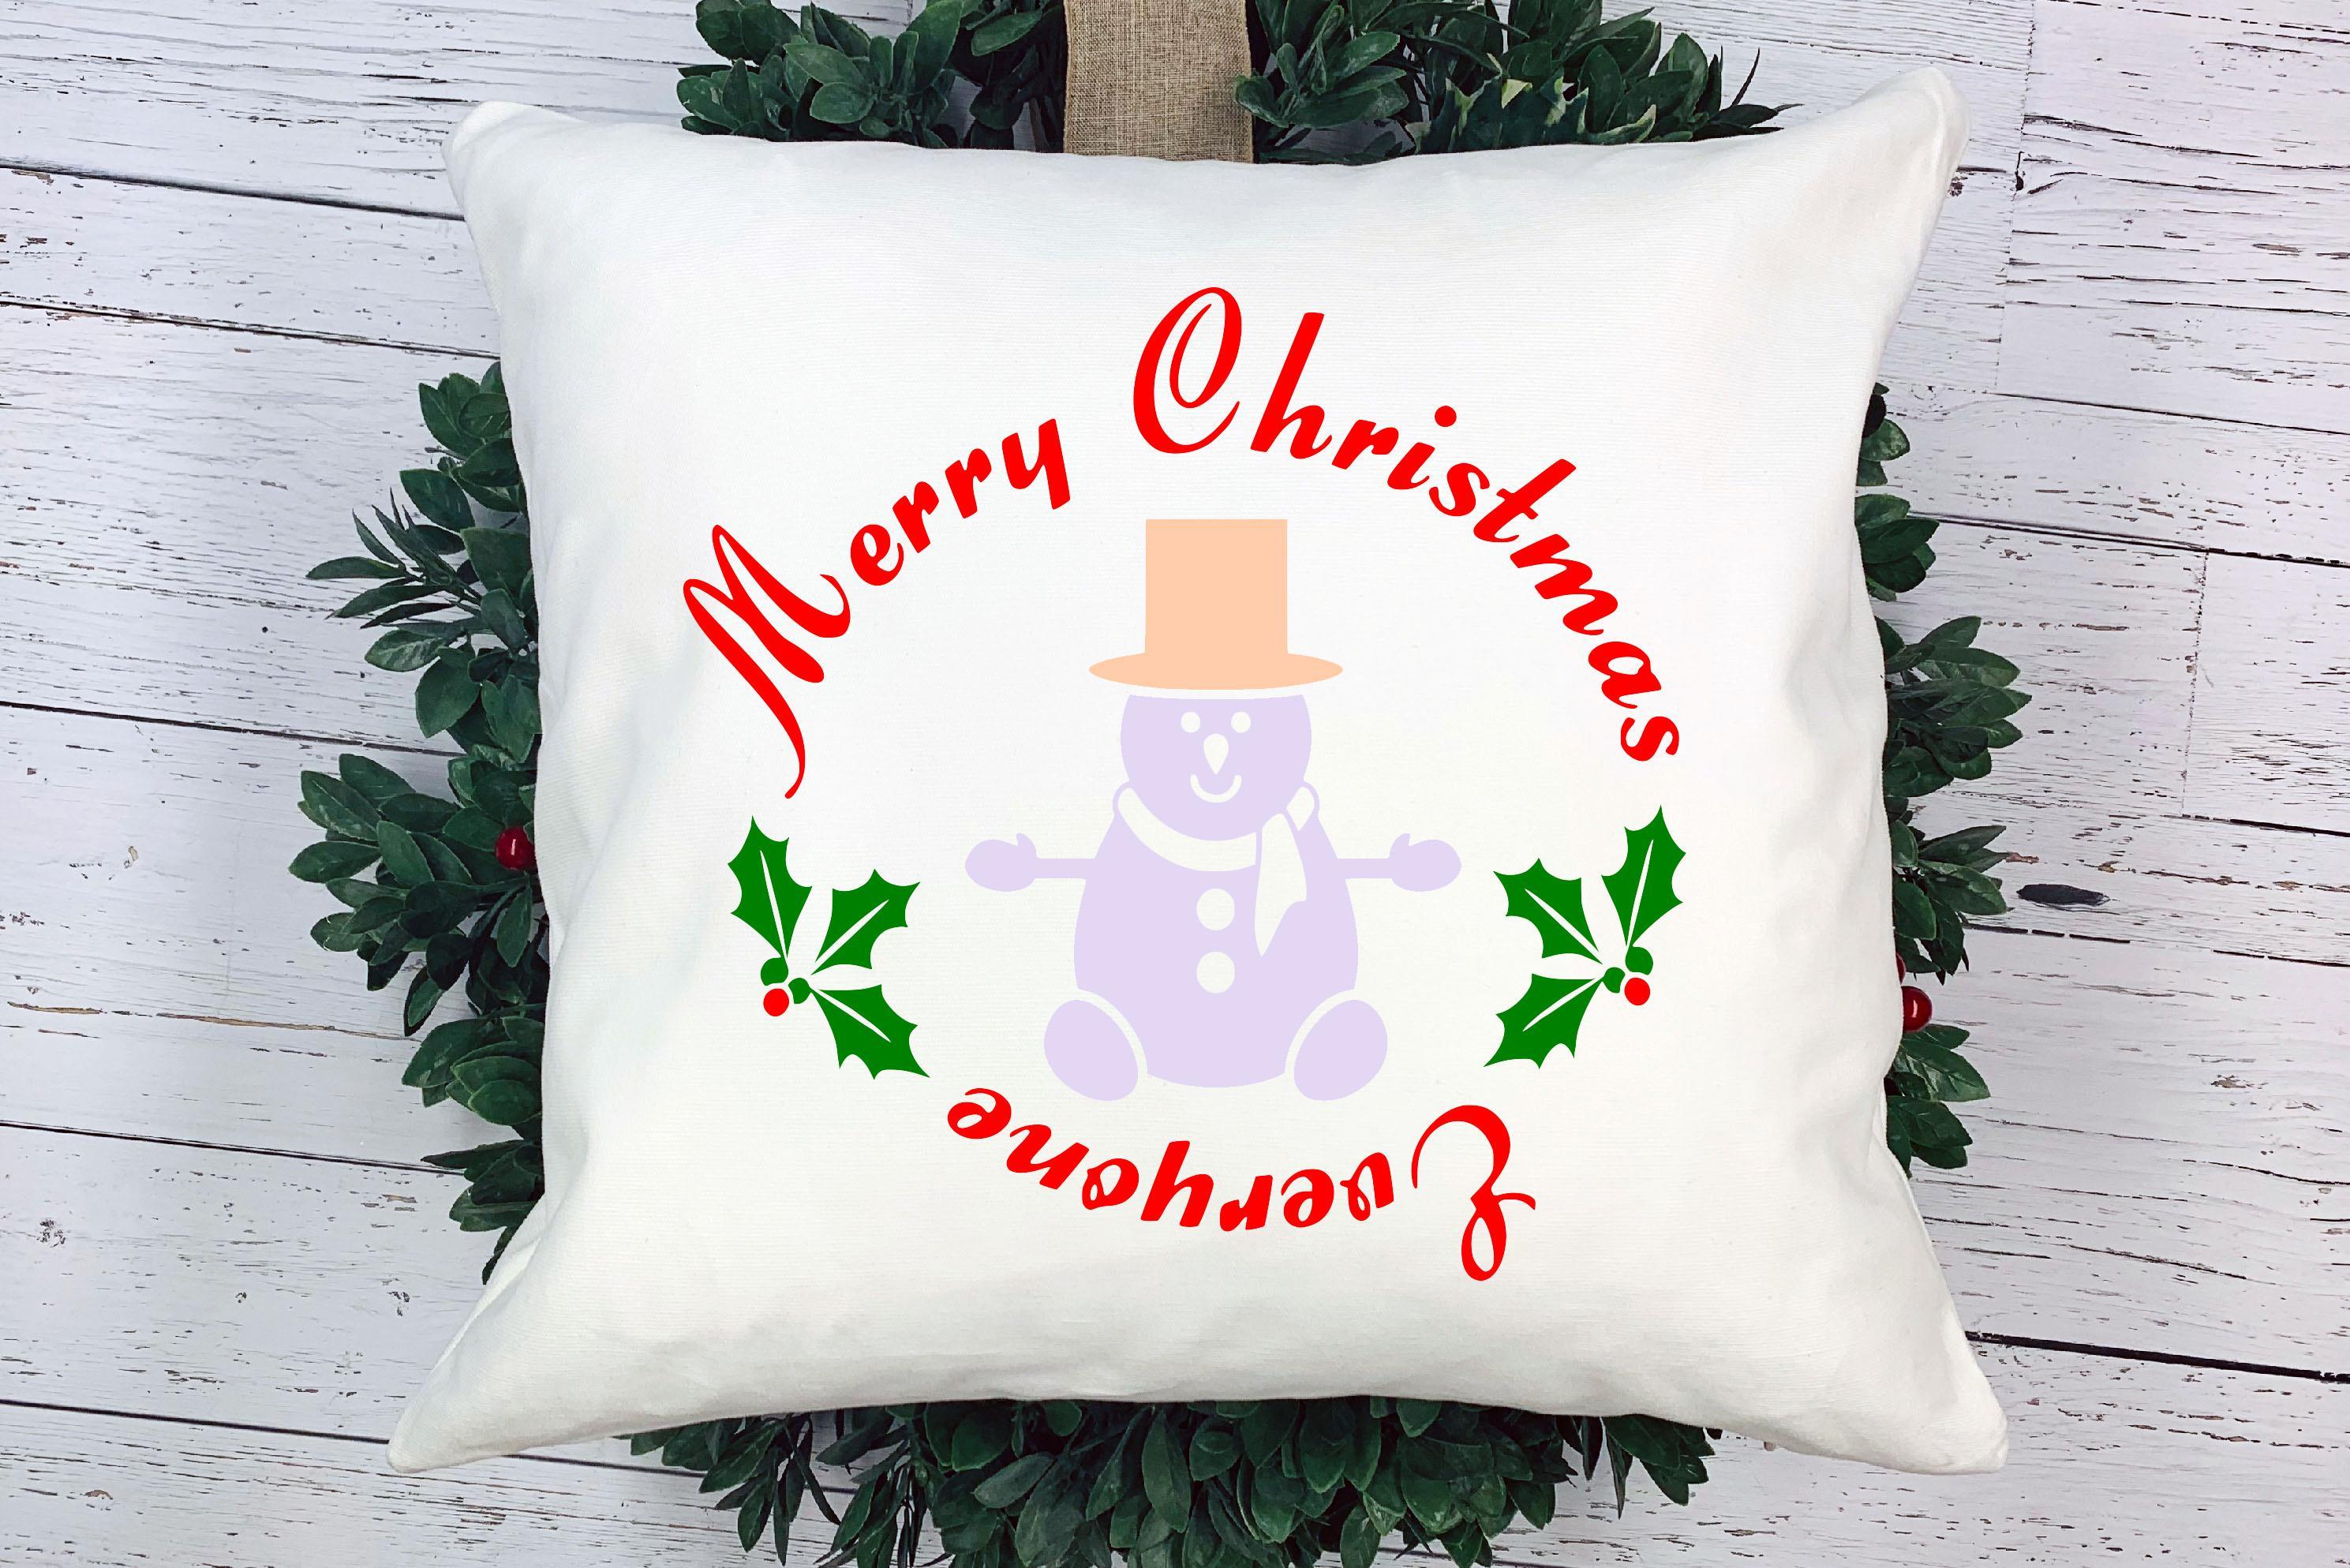 Free Merry Christmas Everyone SVG File